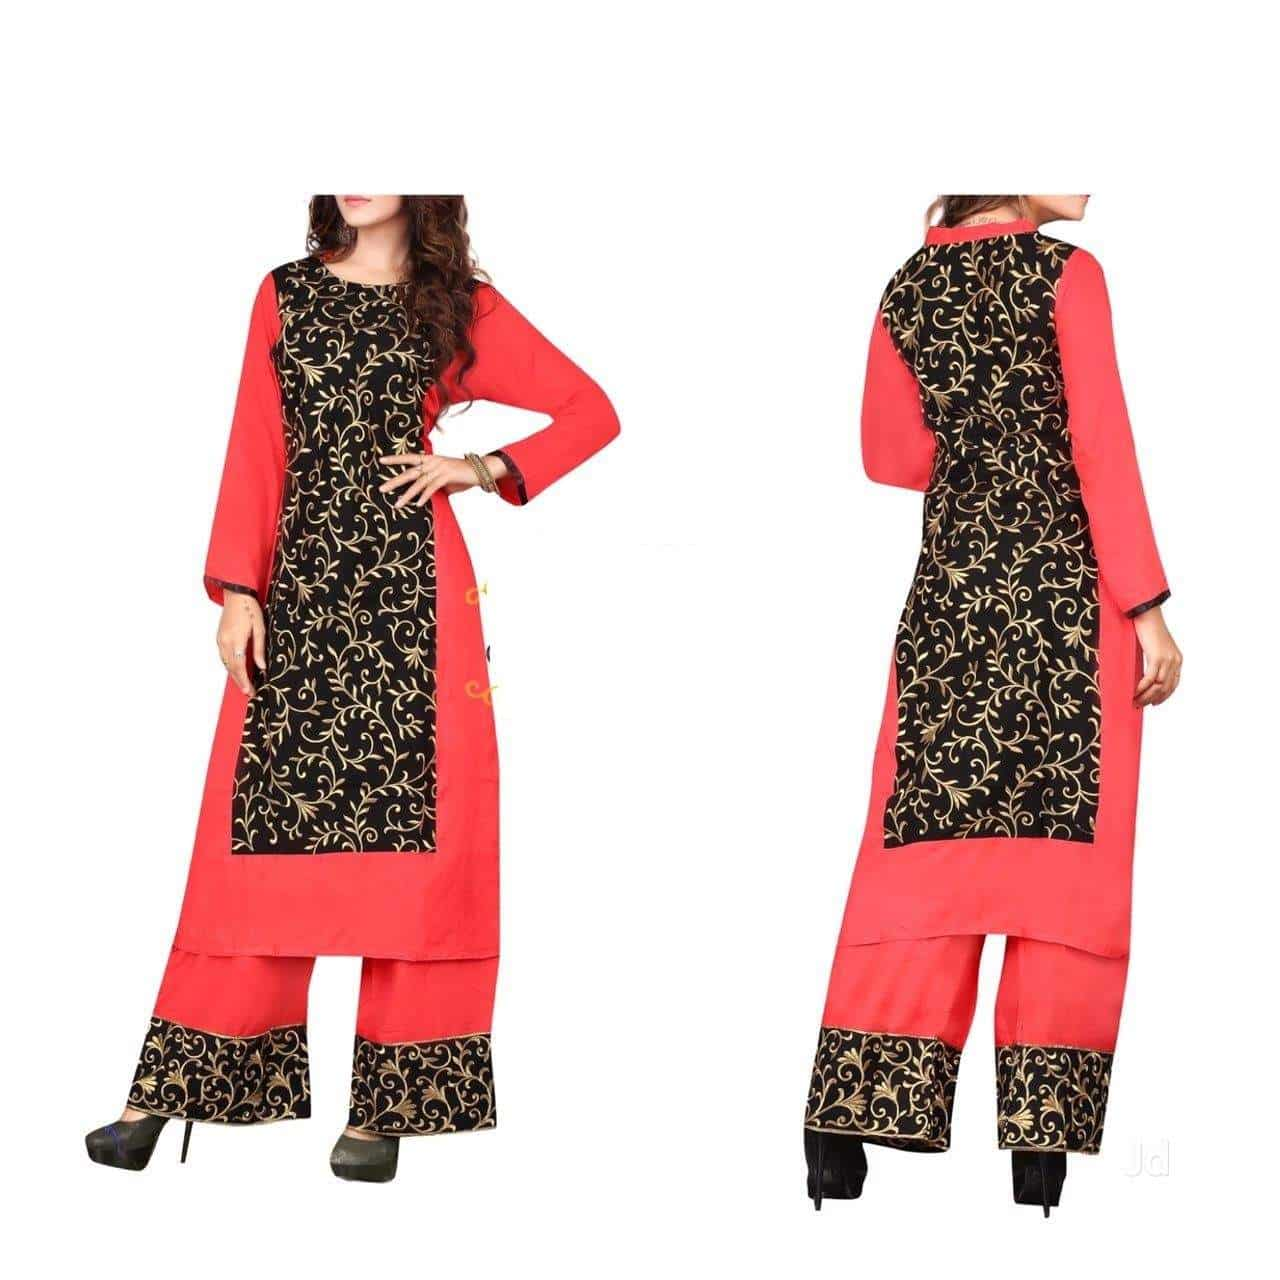 db15cb105e ... Stitched Embroidery Lawn Kurties - R S Designers Photos, Edi Bazar,  Hyderabad - Women Boutiques ...